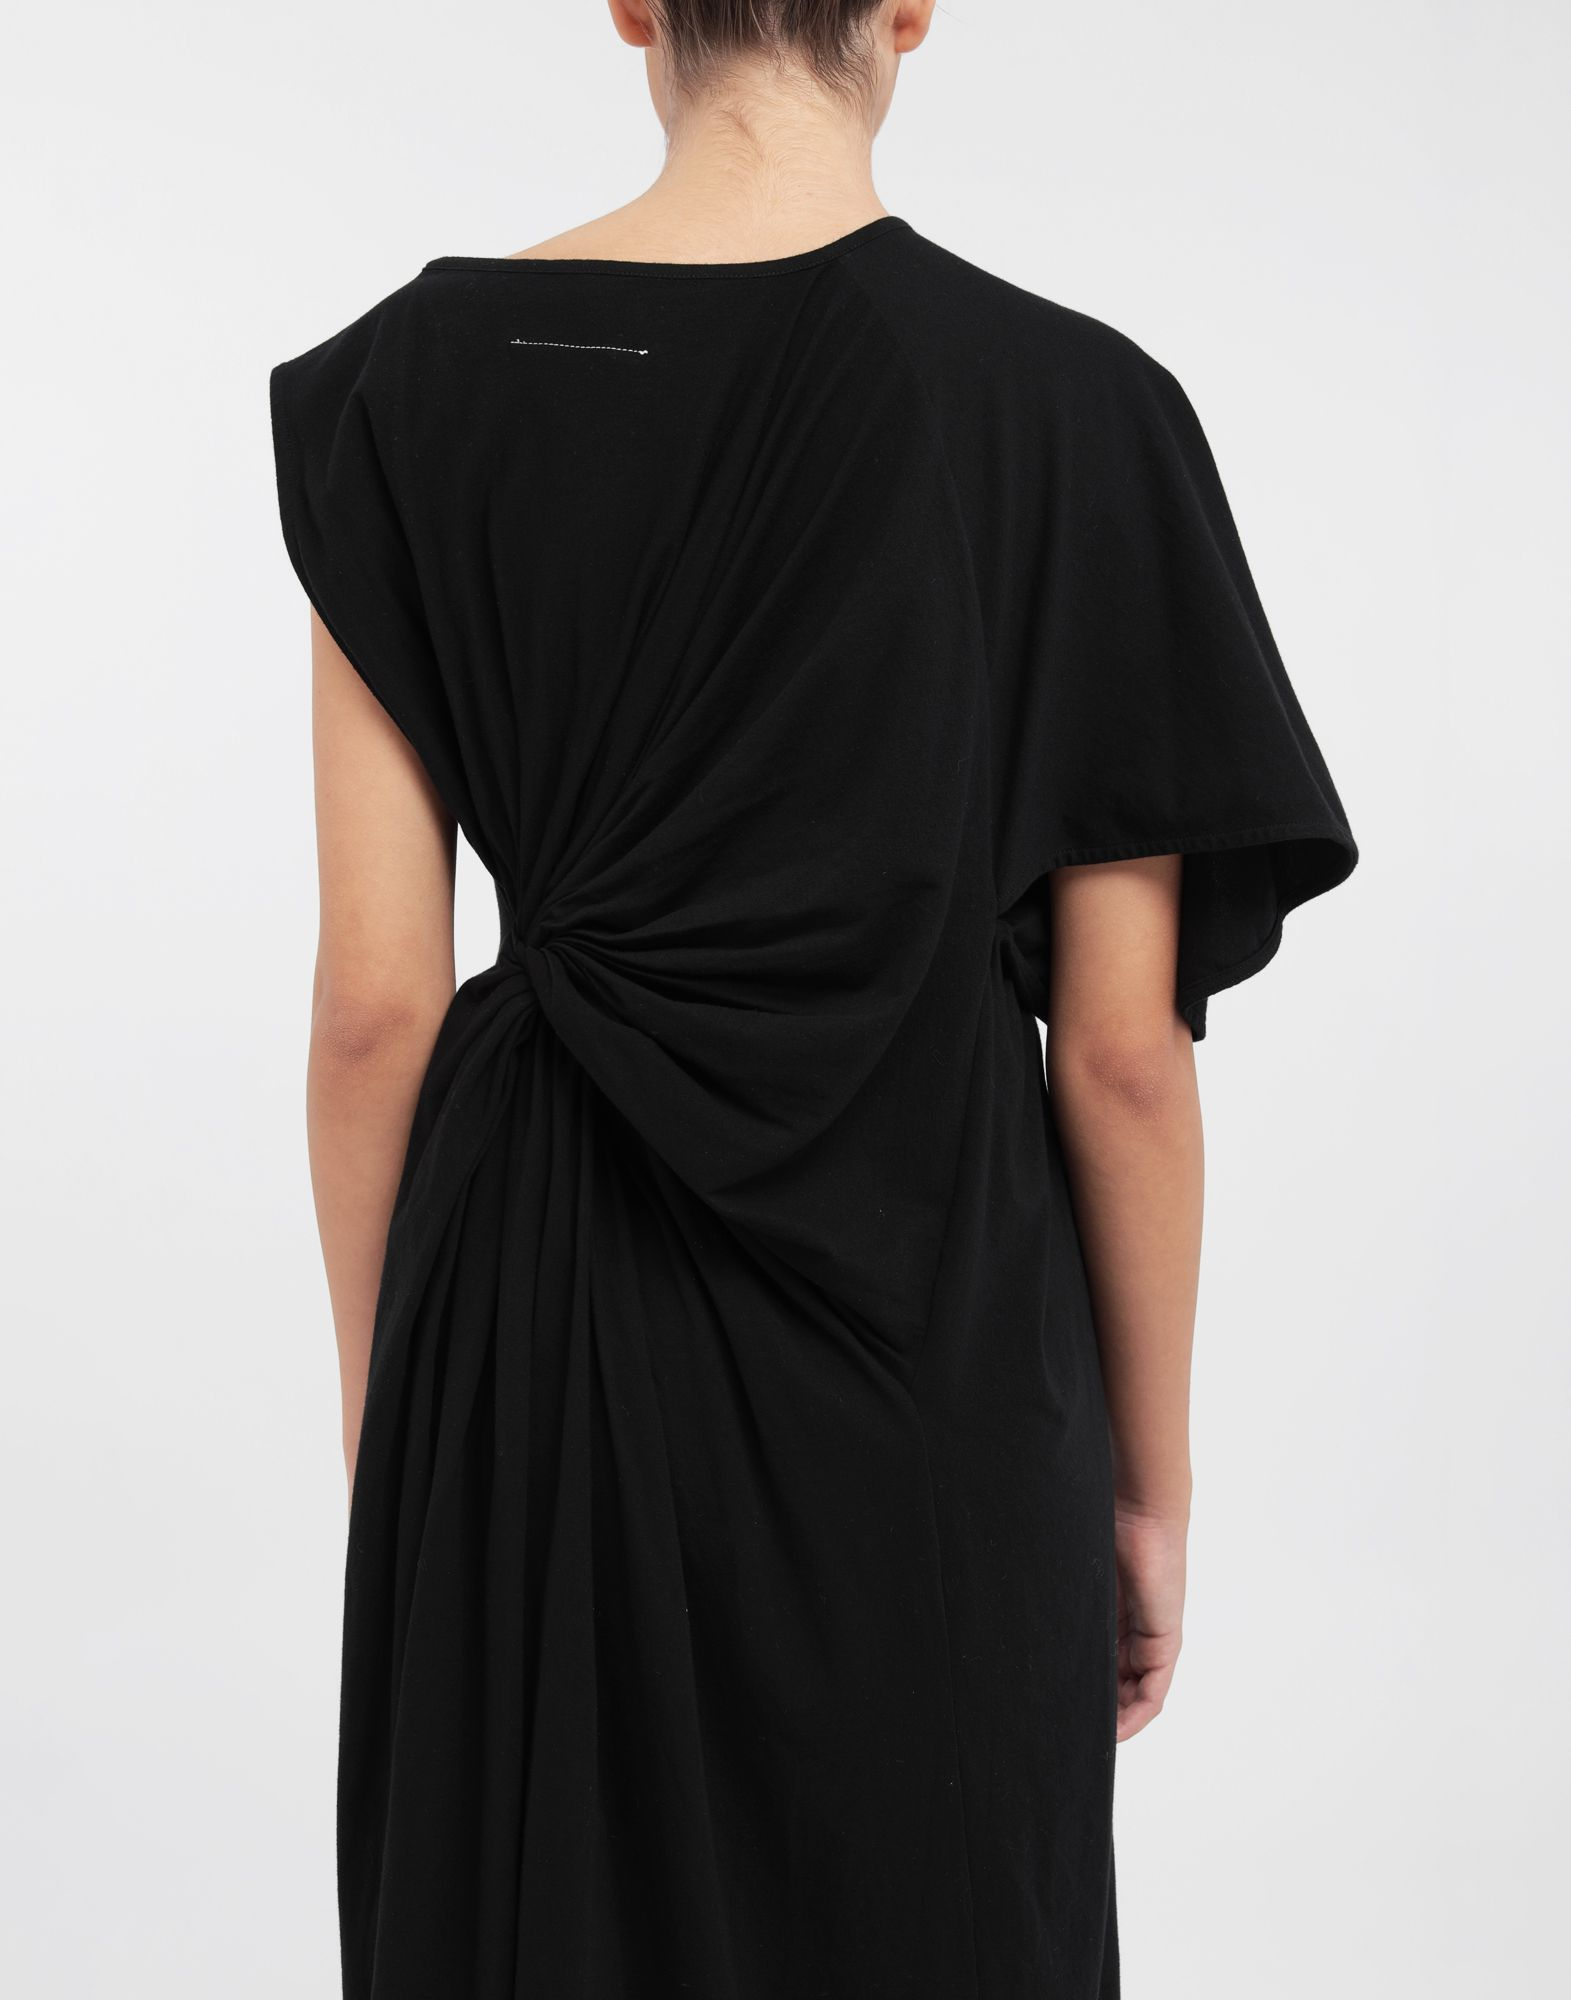 MM6 MAISON MARGIELA Asymmetrical jersey midi dress 3/4 length dress Woman b